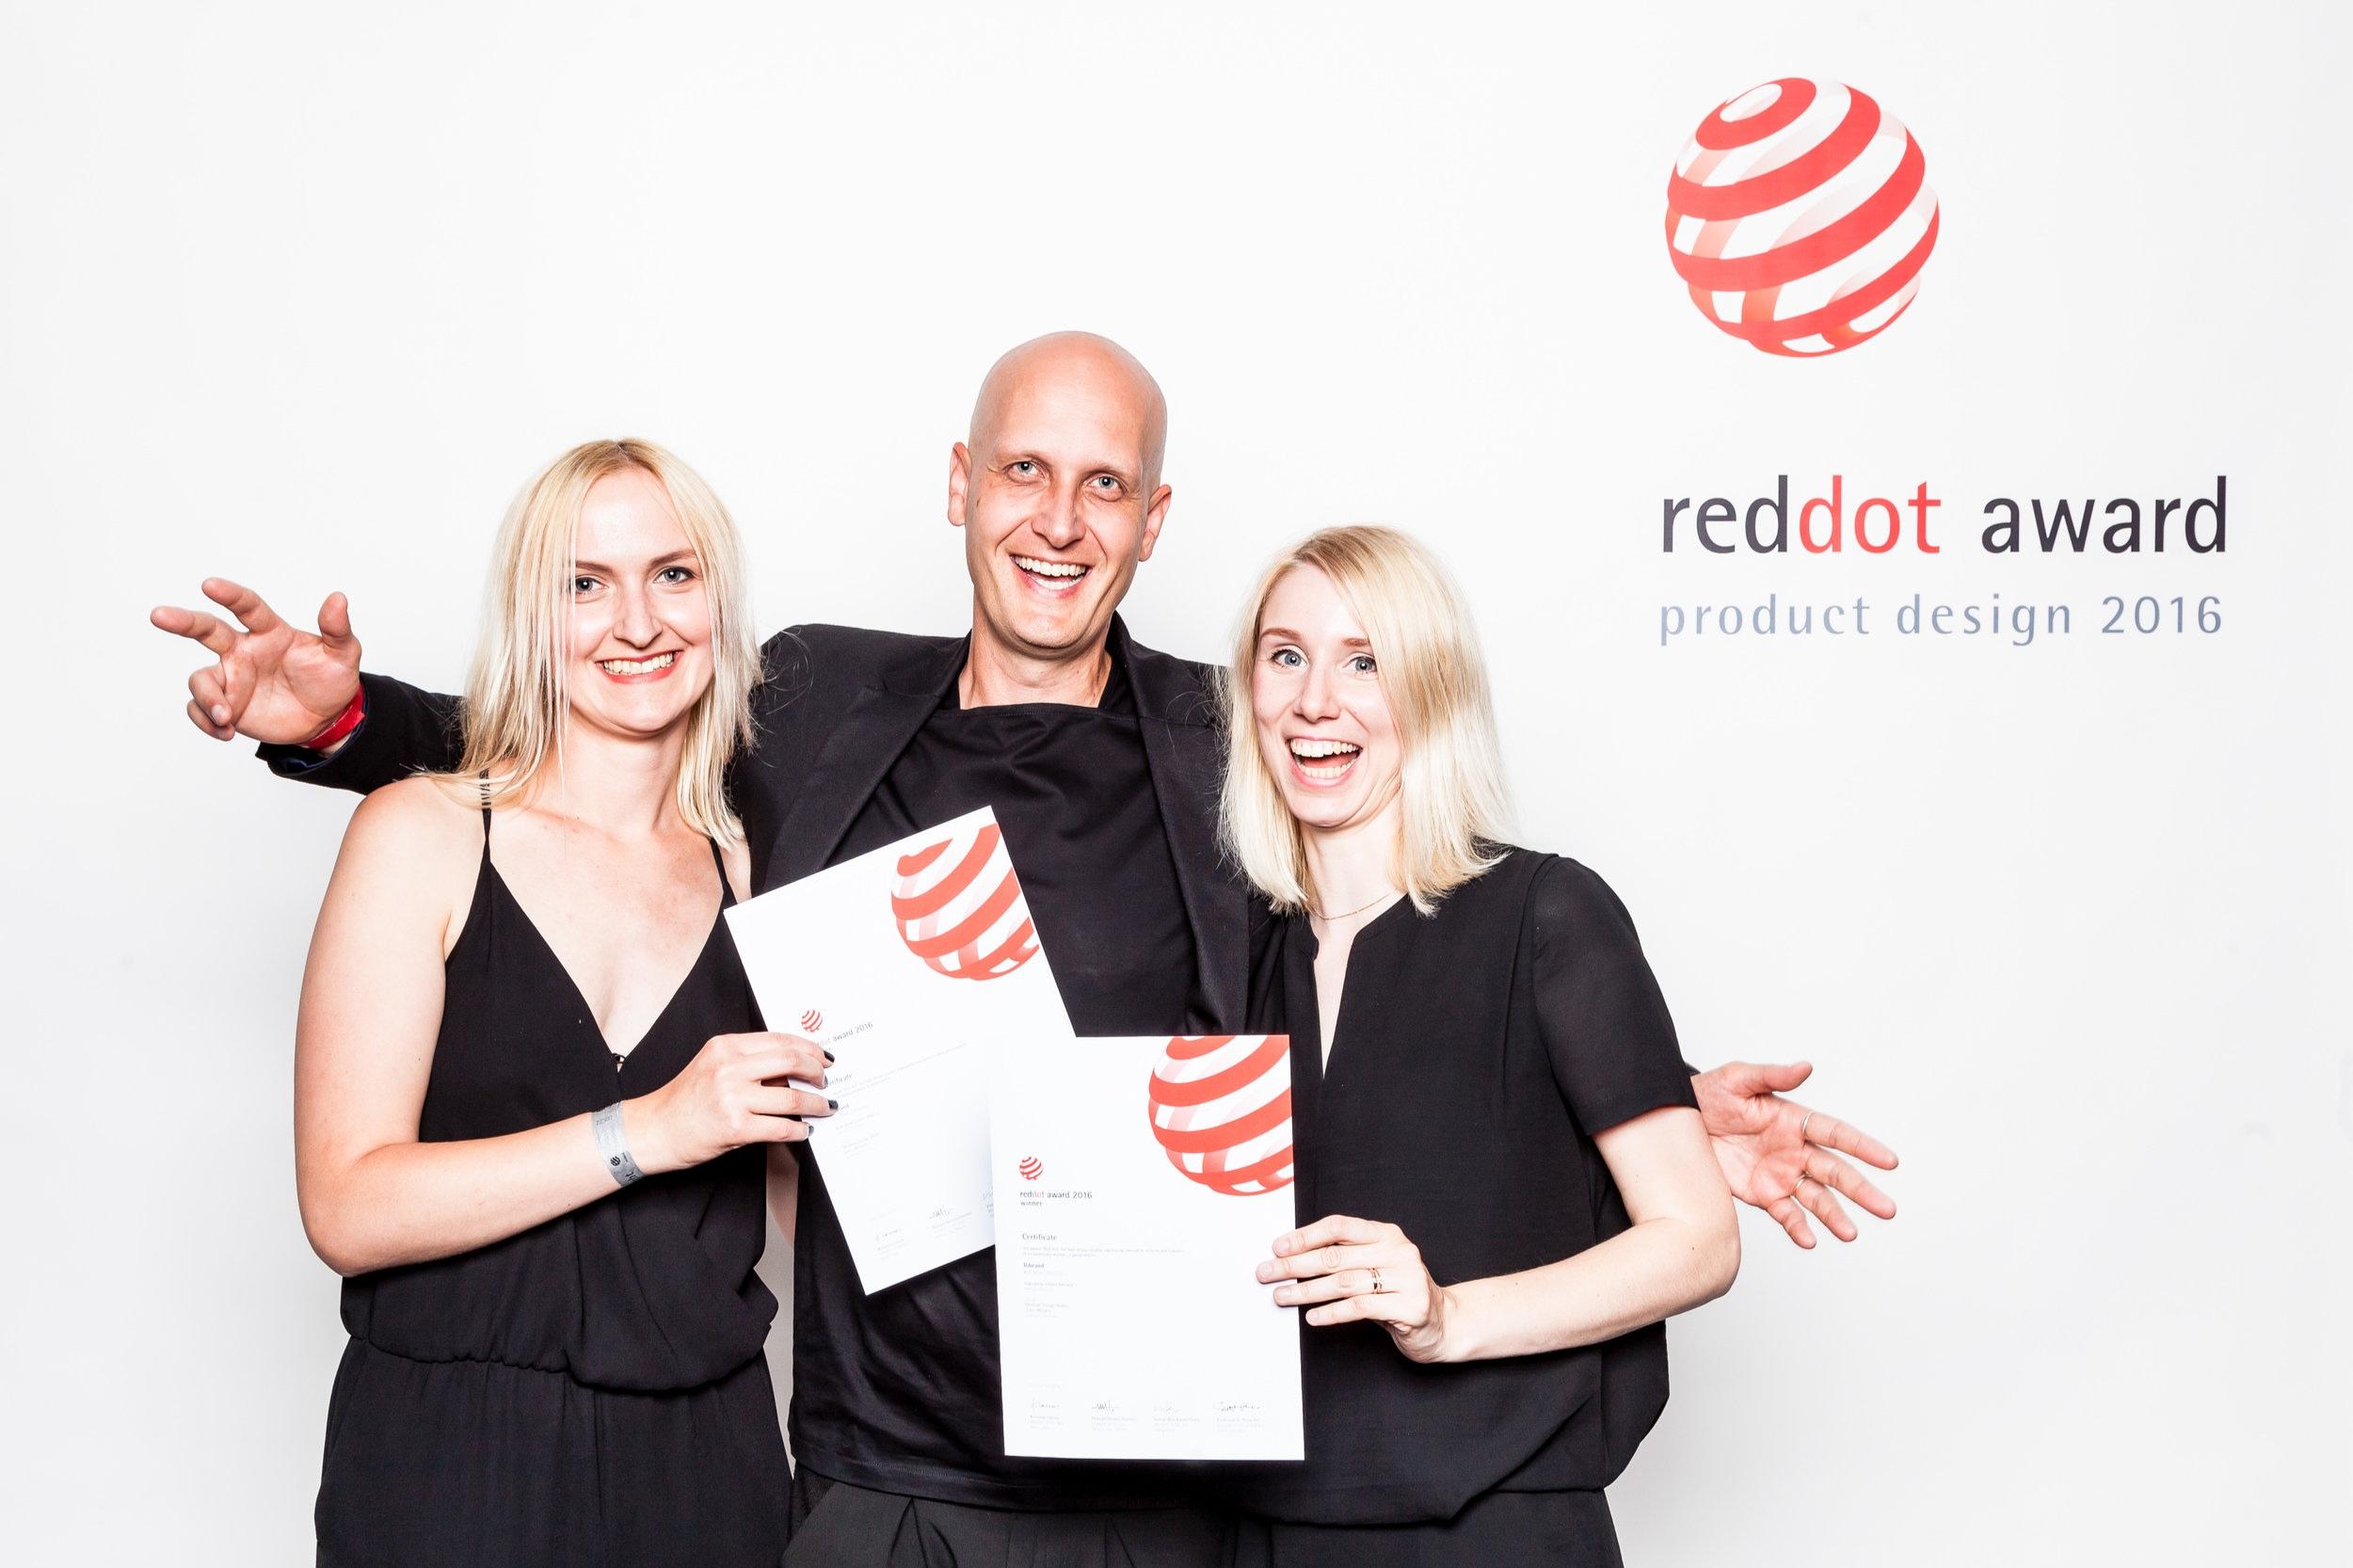 RedDot Award Product Design 2016